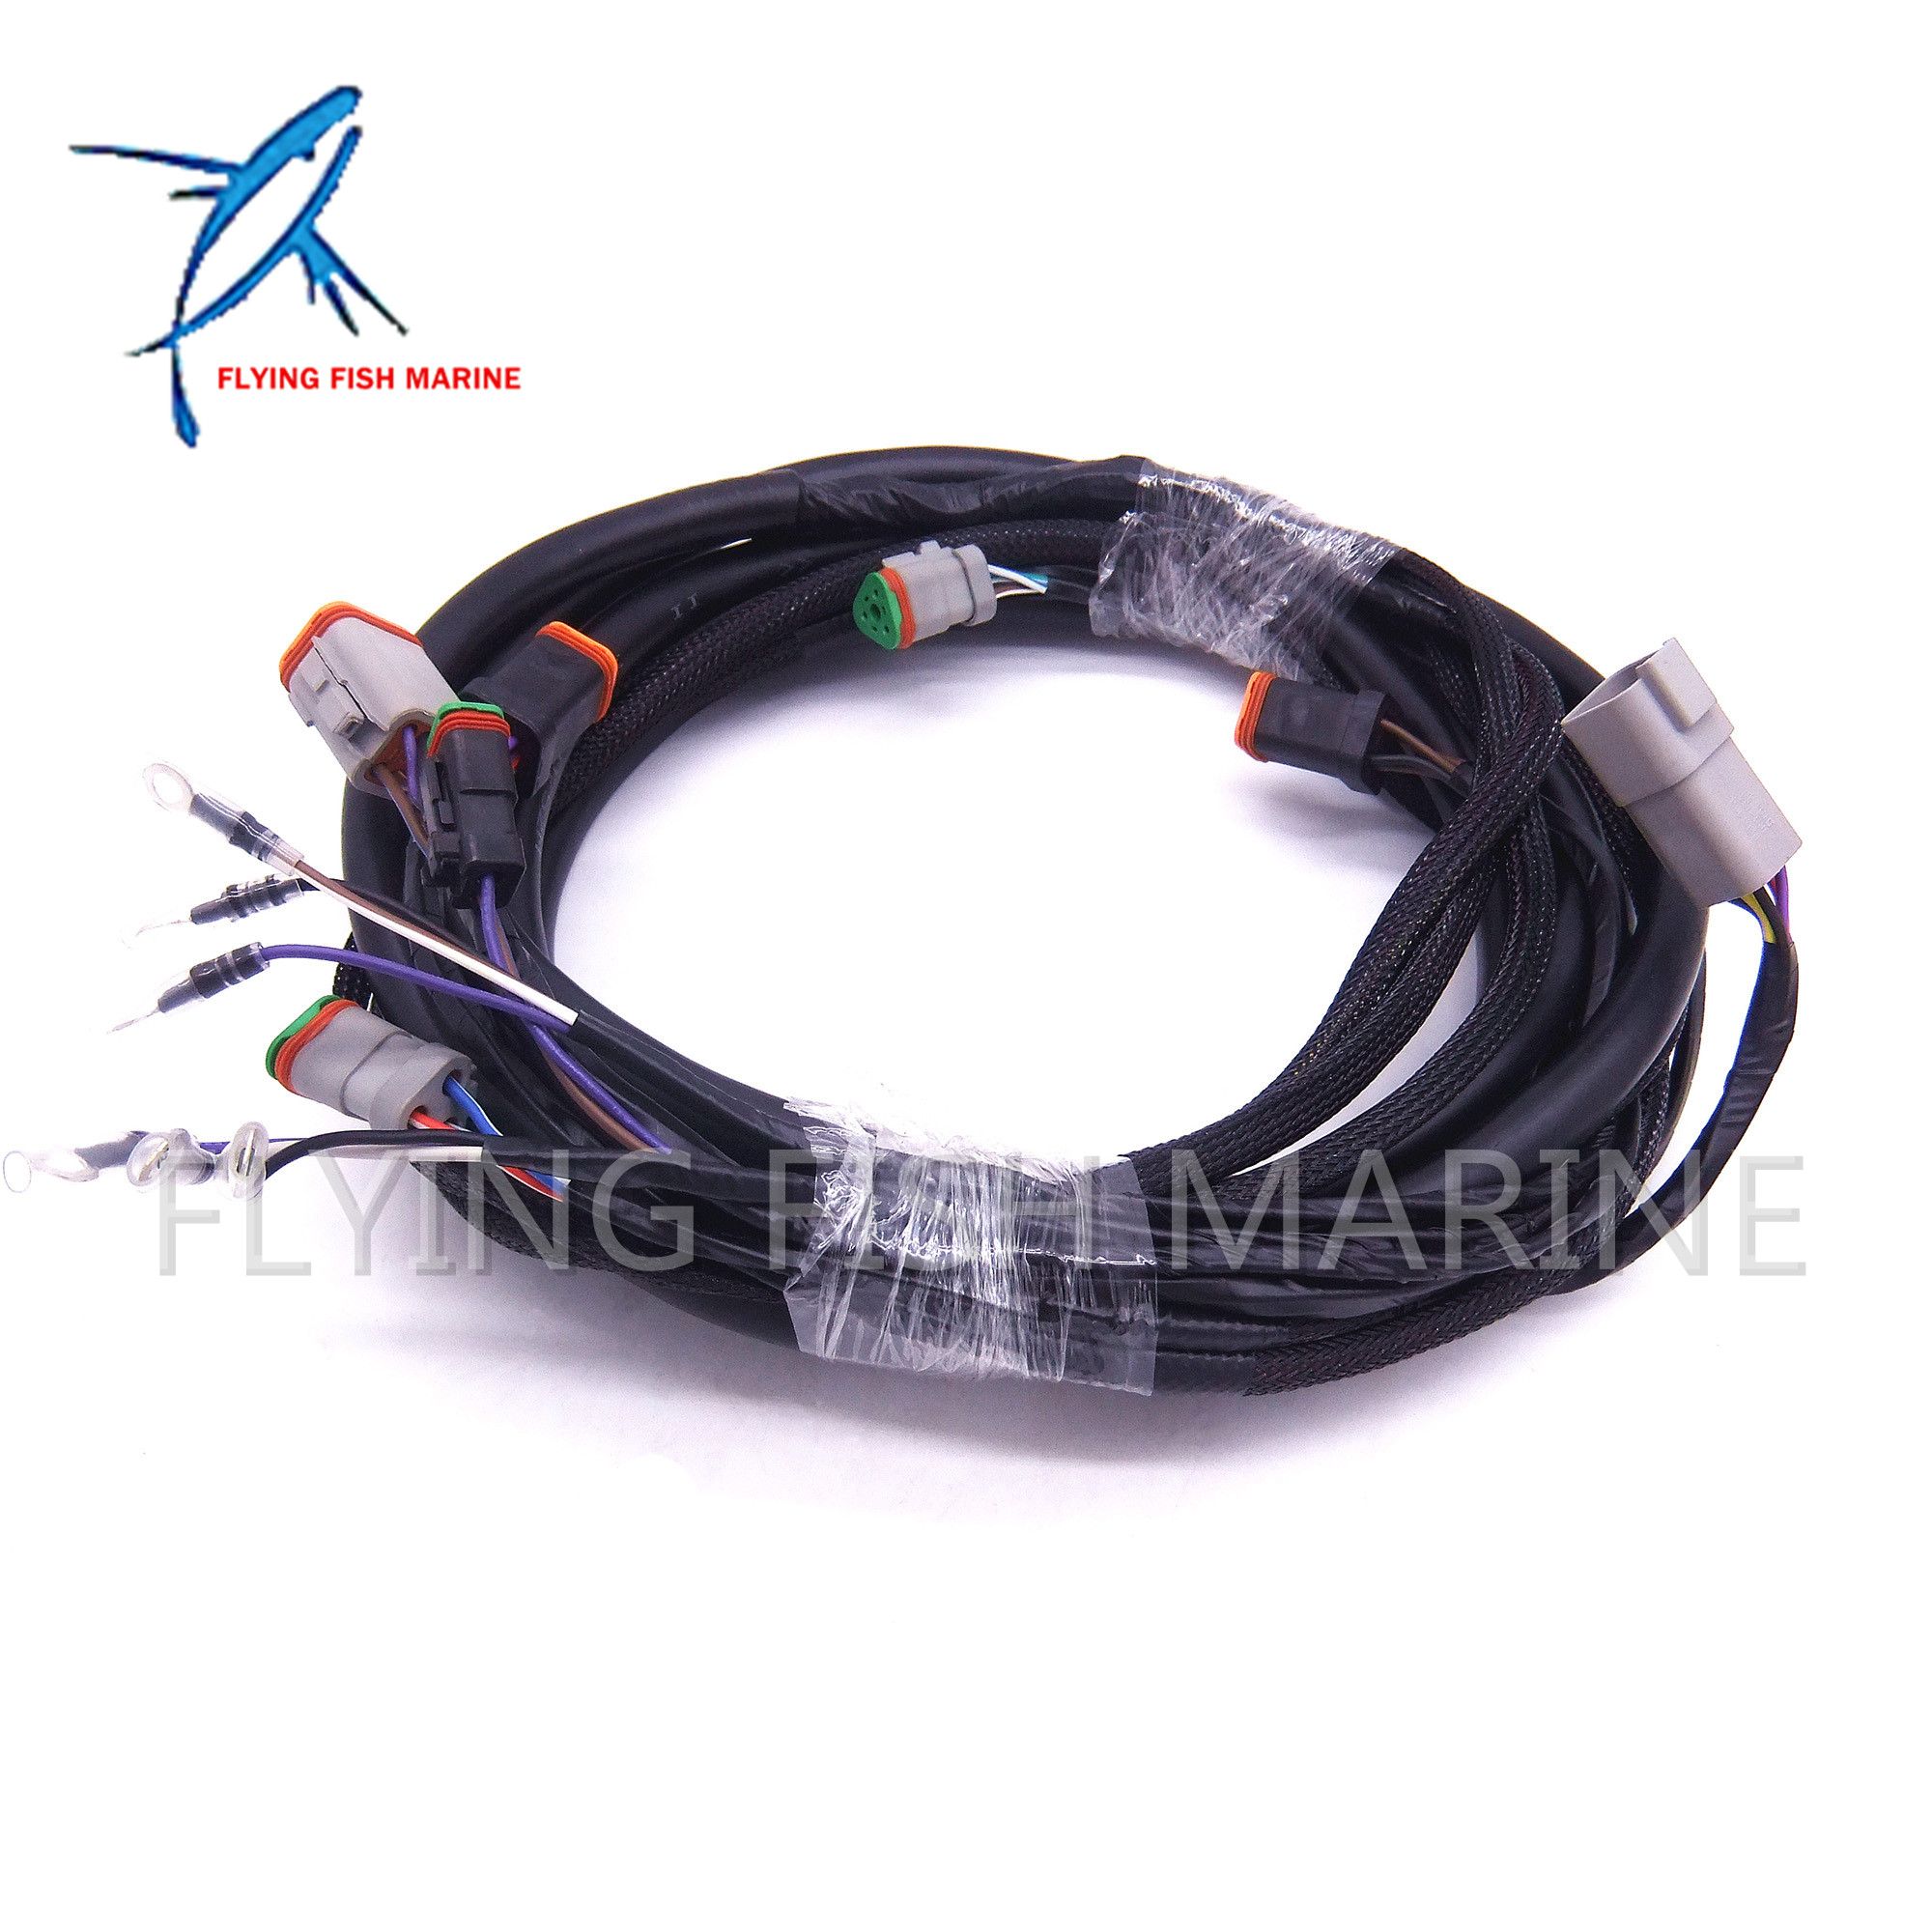 Modular Boat Wiring Harness - good #1st wiring diagram